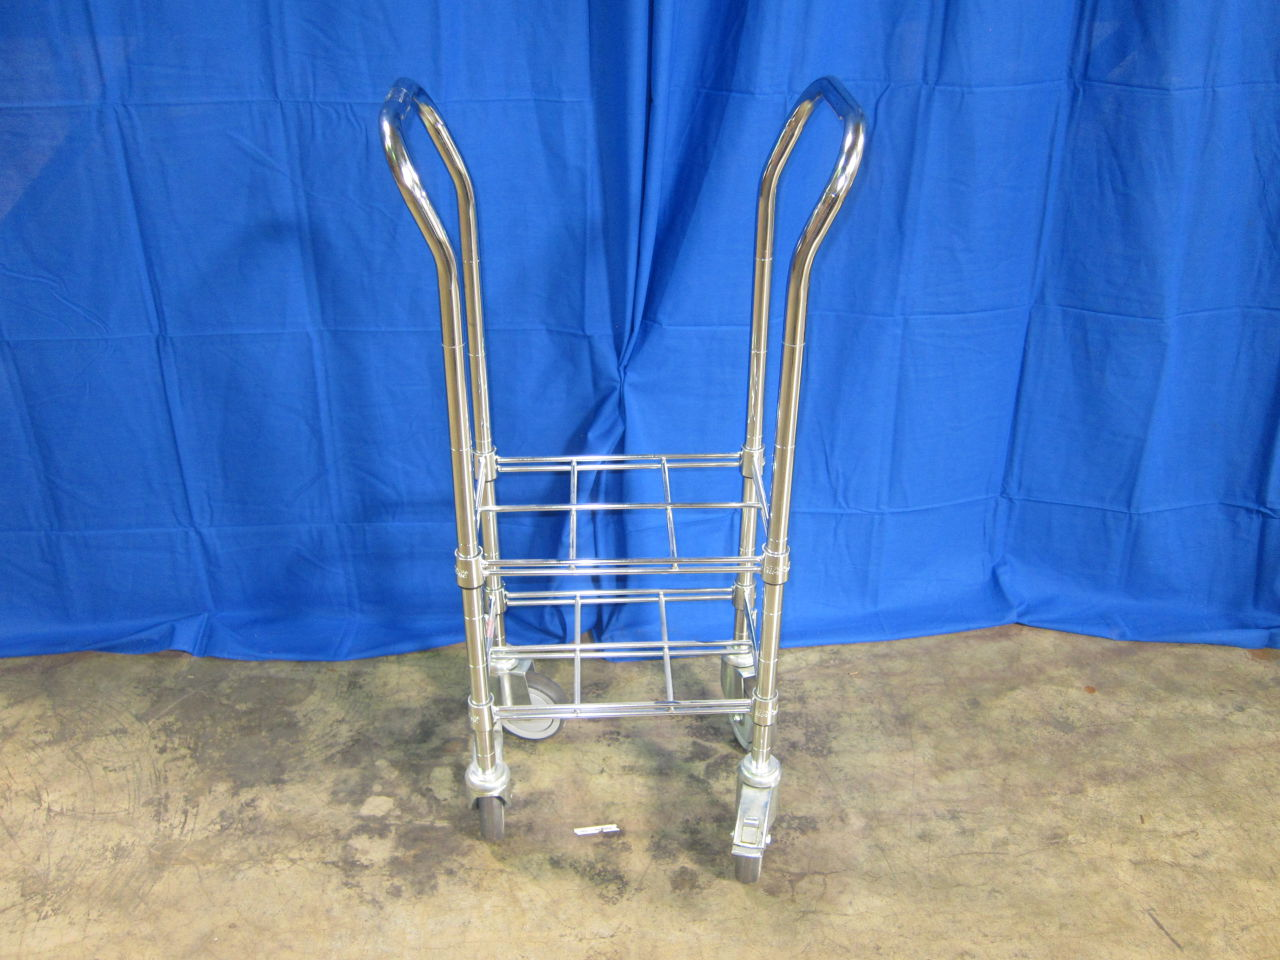 WT FARLEY Stainless Steel Mini Rack